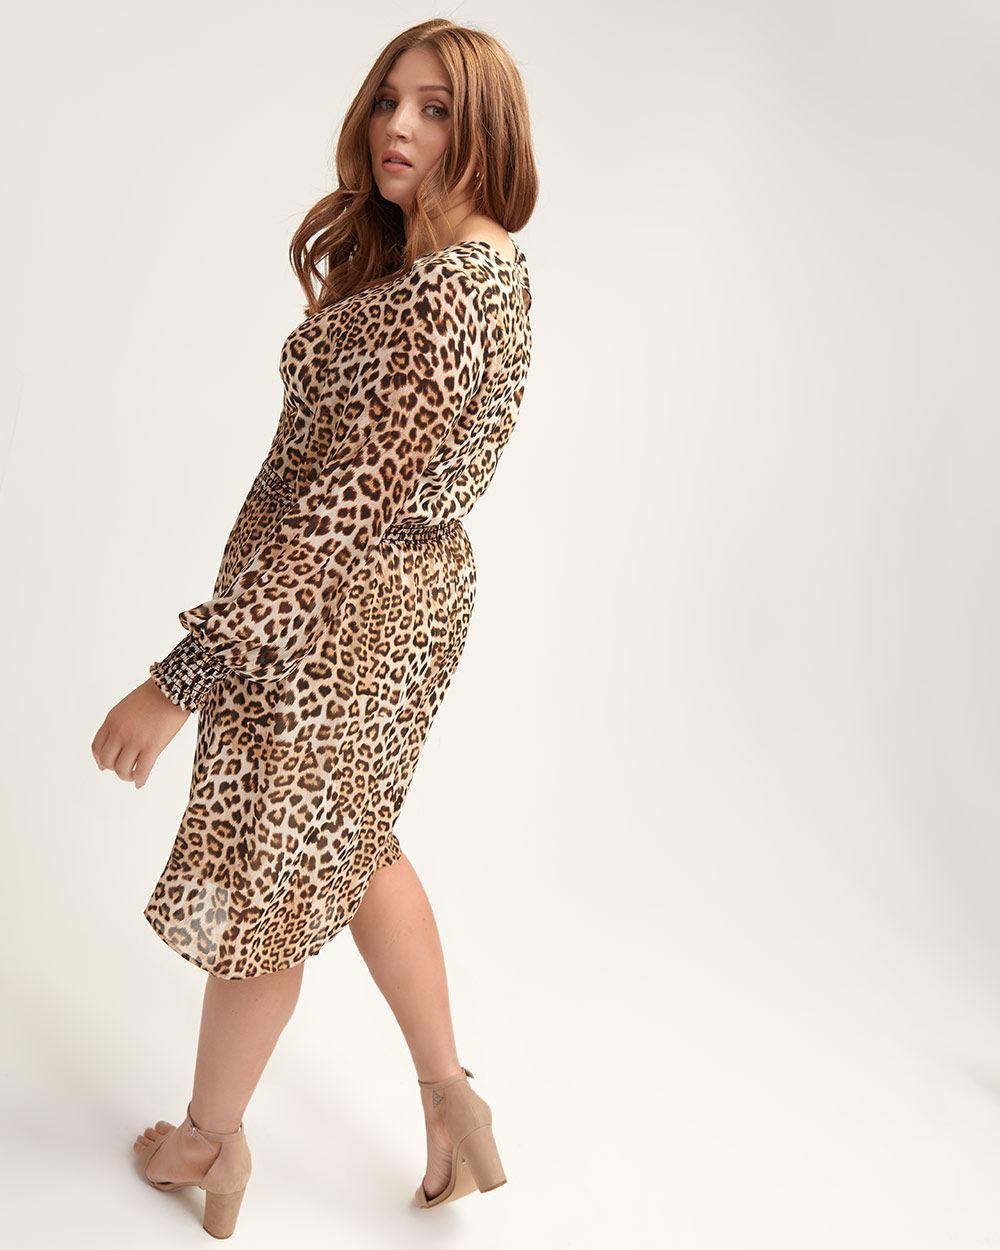 37da500059 Lyst - Addition Elle Leopard-print Dress With Smocking Details - L l in  Brown